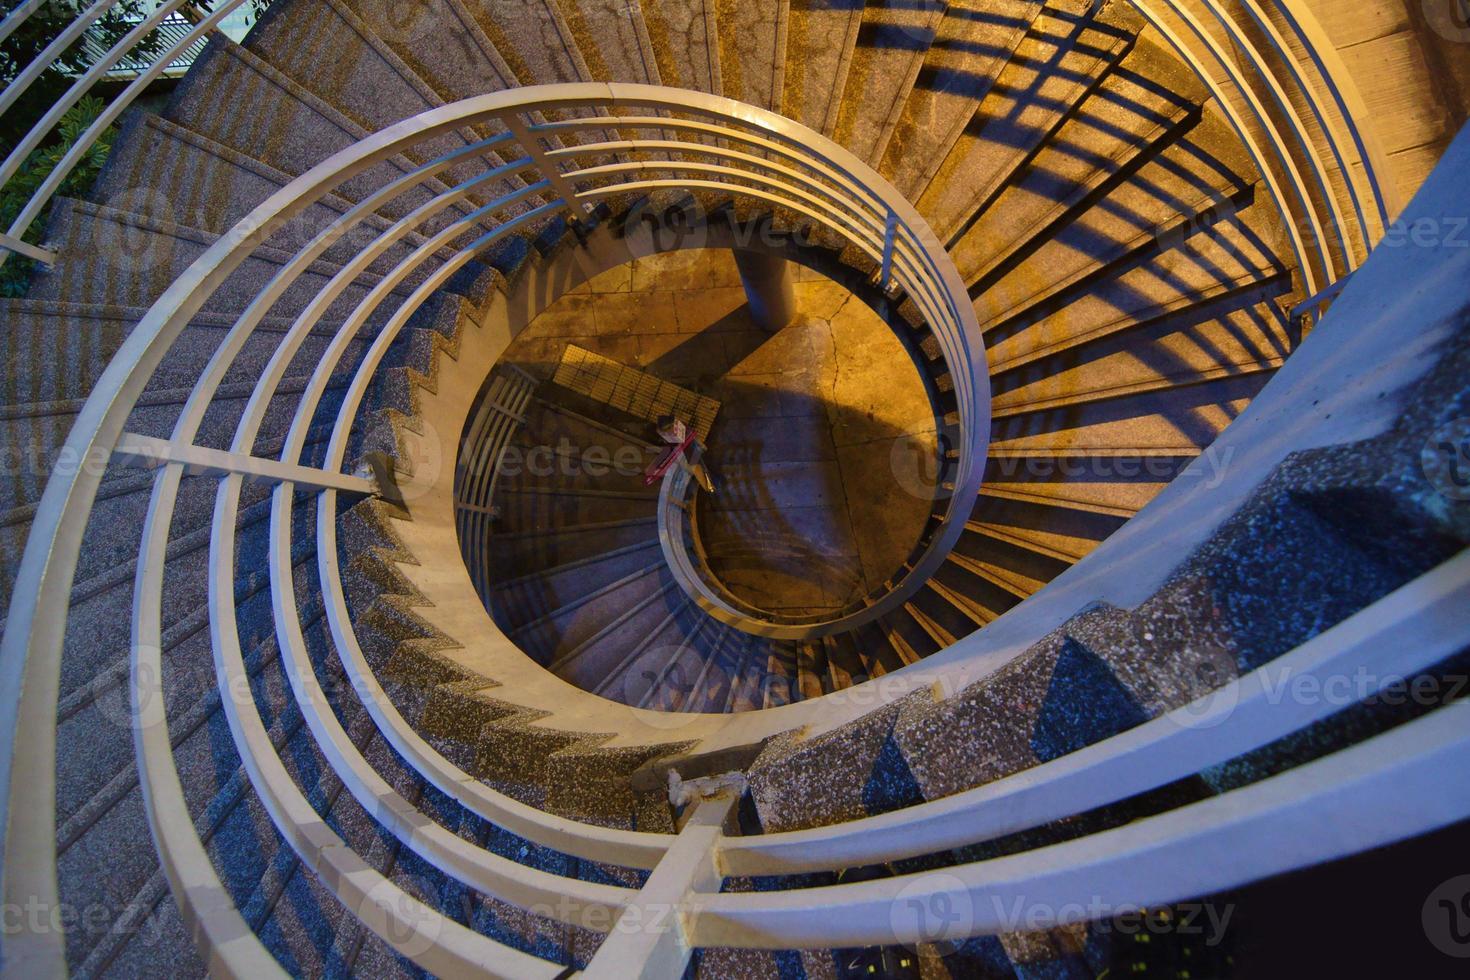 escada em espiral foto